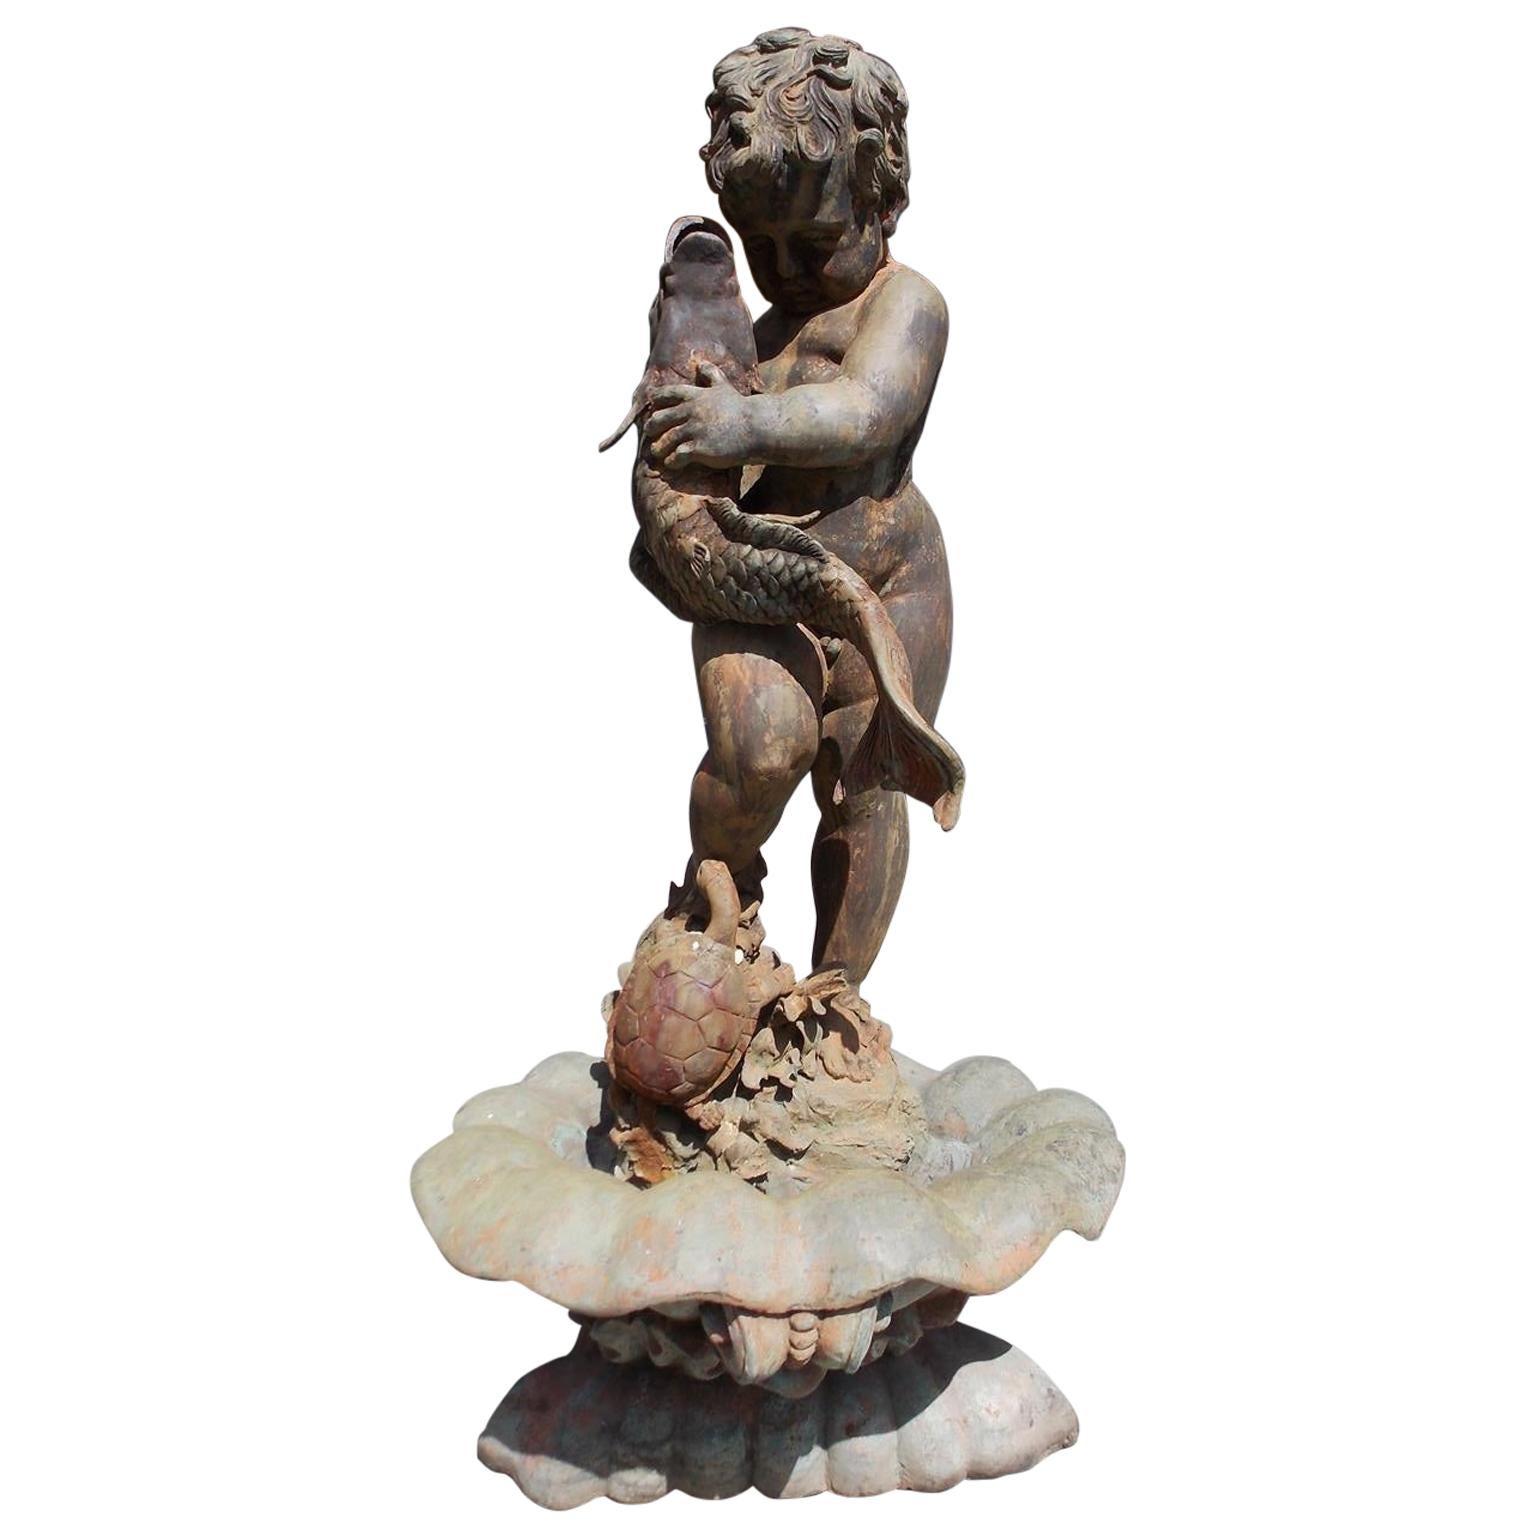 American Cast Bronze Garden Fountain with Figural Boy Holding Koi Fish. C. 1870